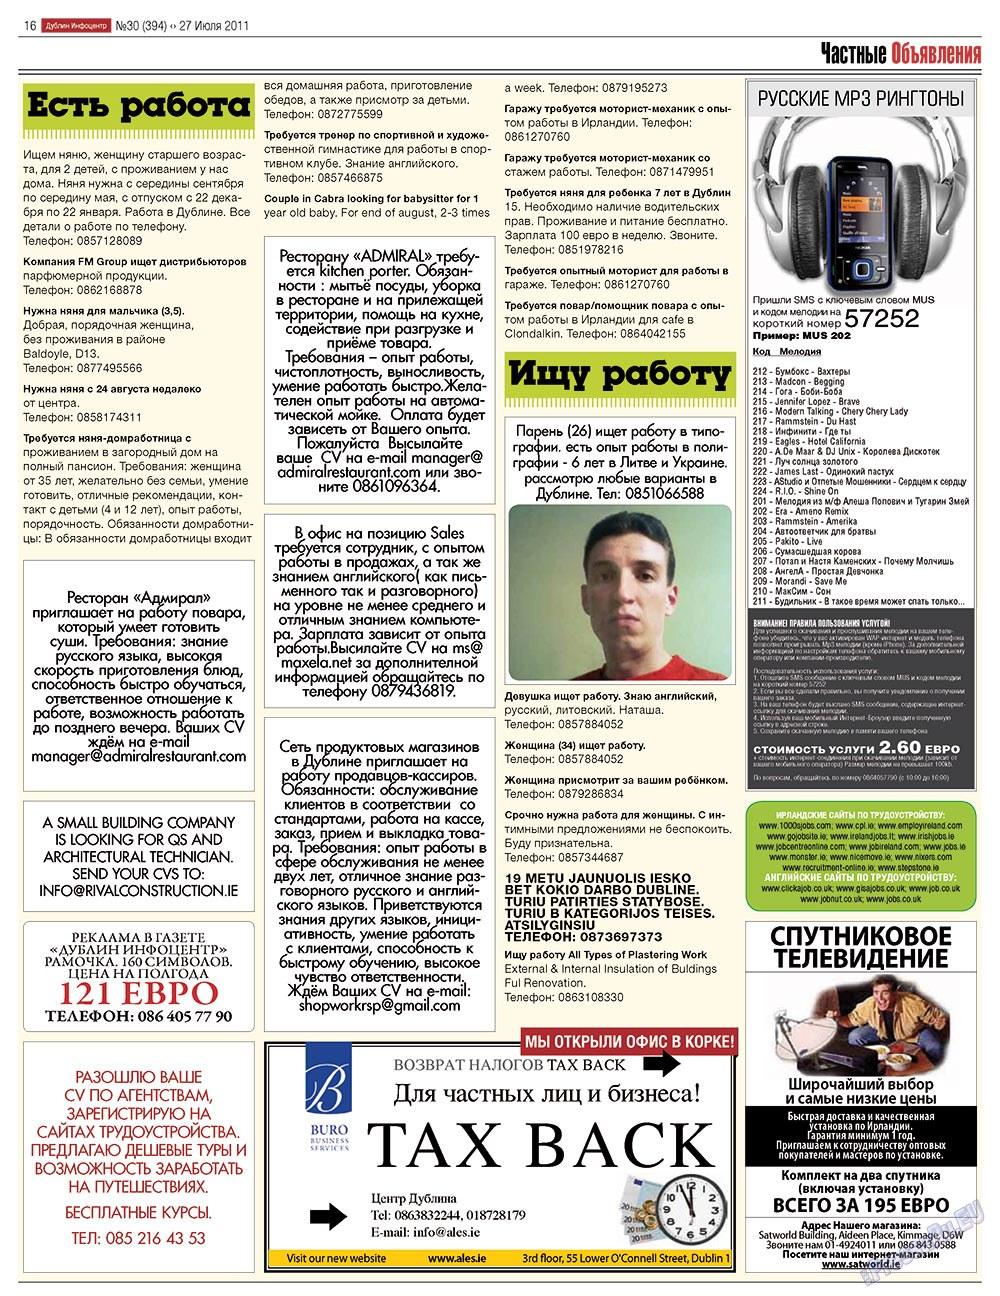 Дублин инфоцентр (газета). 2011 год, номер 30, стр. 16